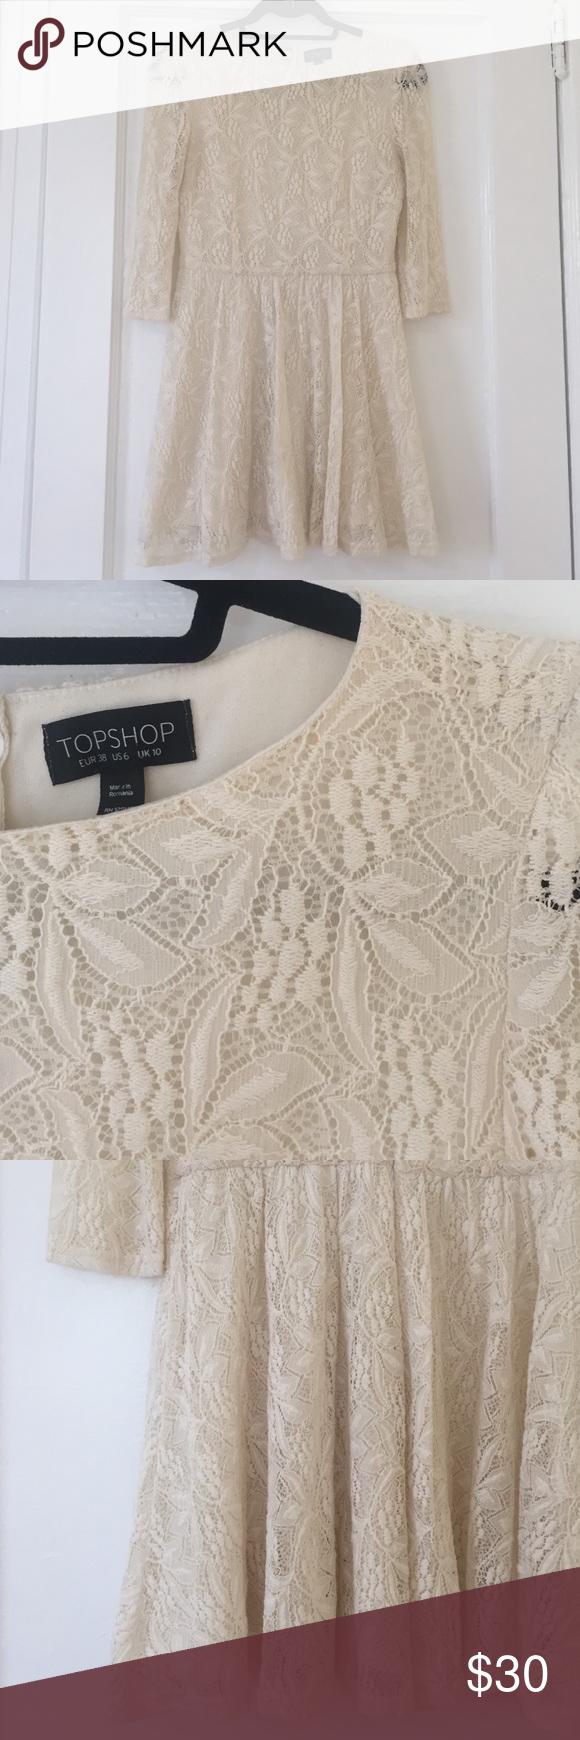 White lace dress zara  Topshop Cream Lace Mini Dress Zara cream bohemian lace dress with